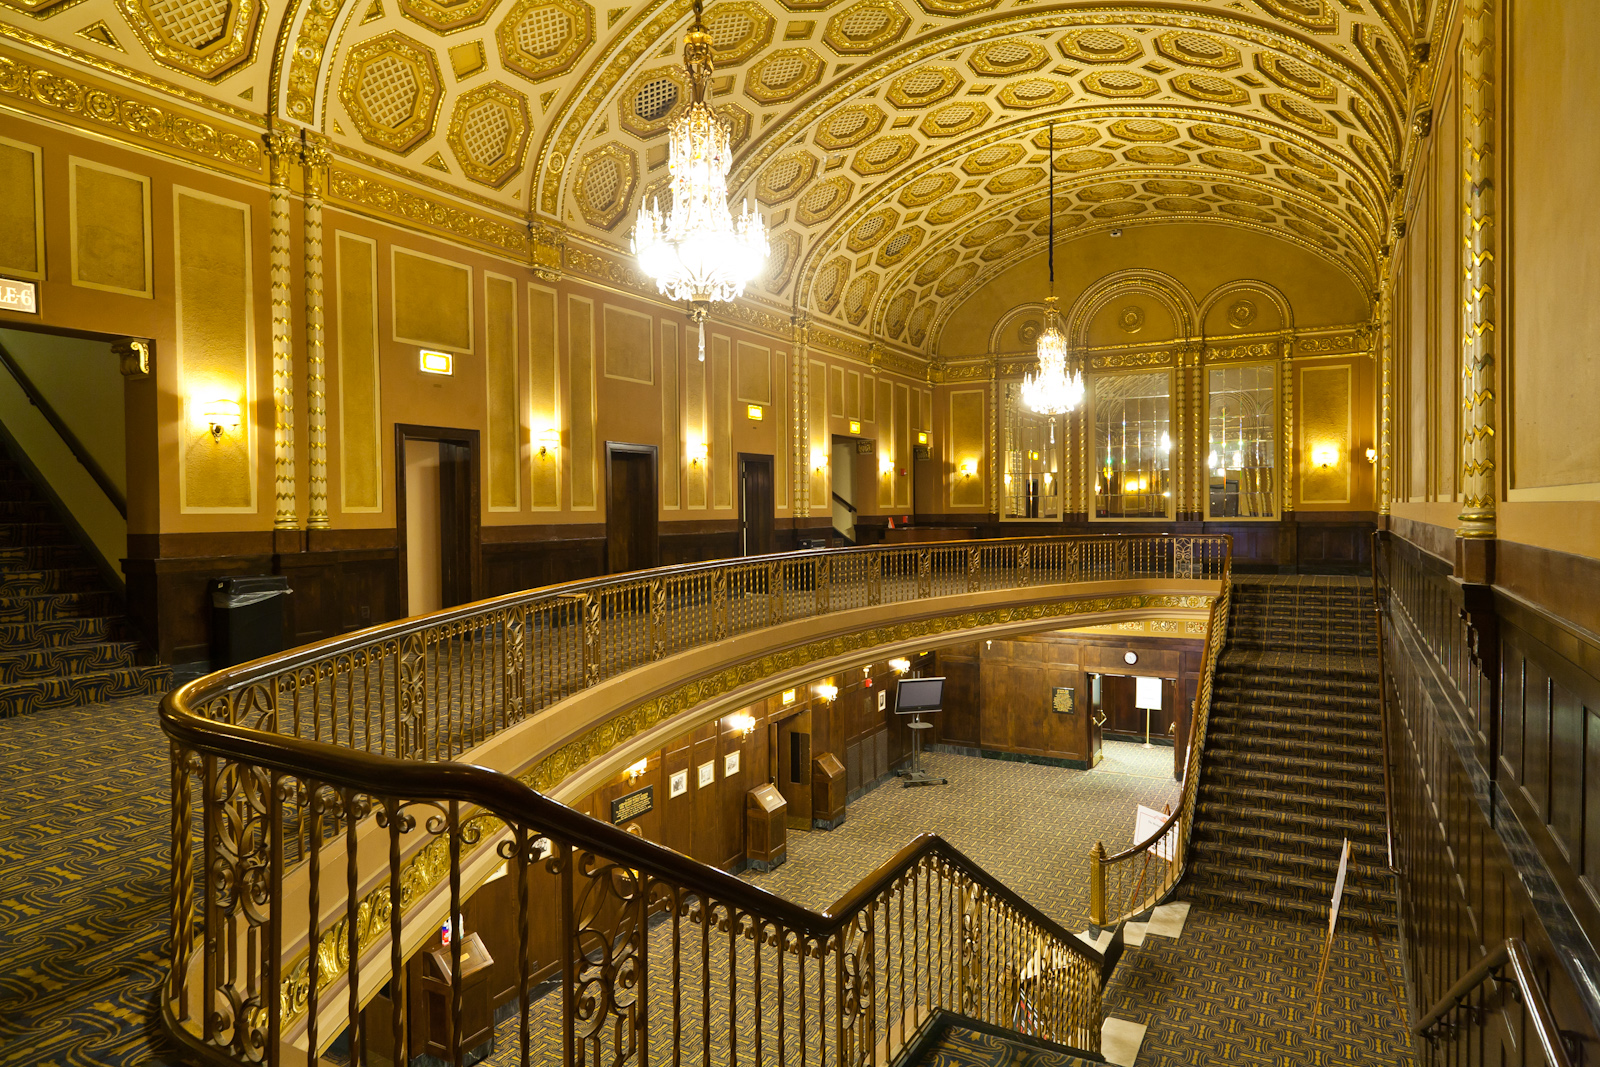 Michigan Theater in Ann Arbor